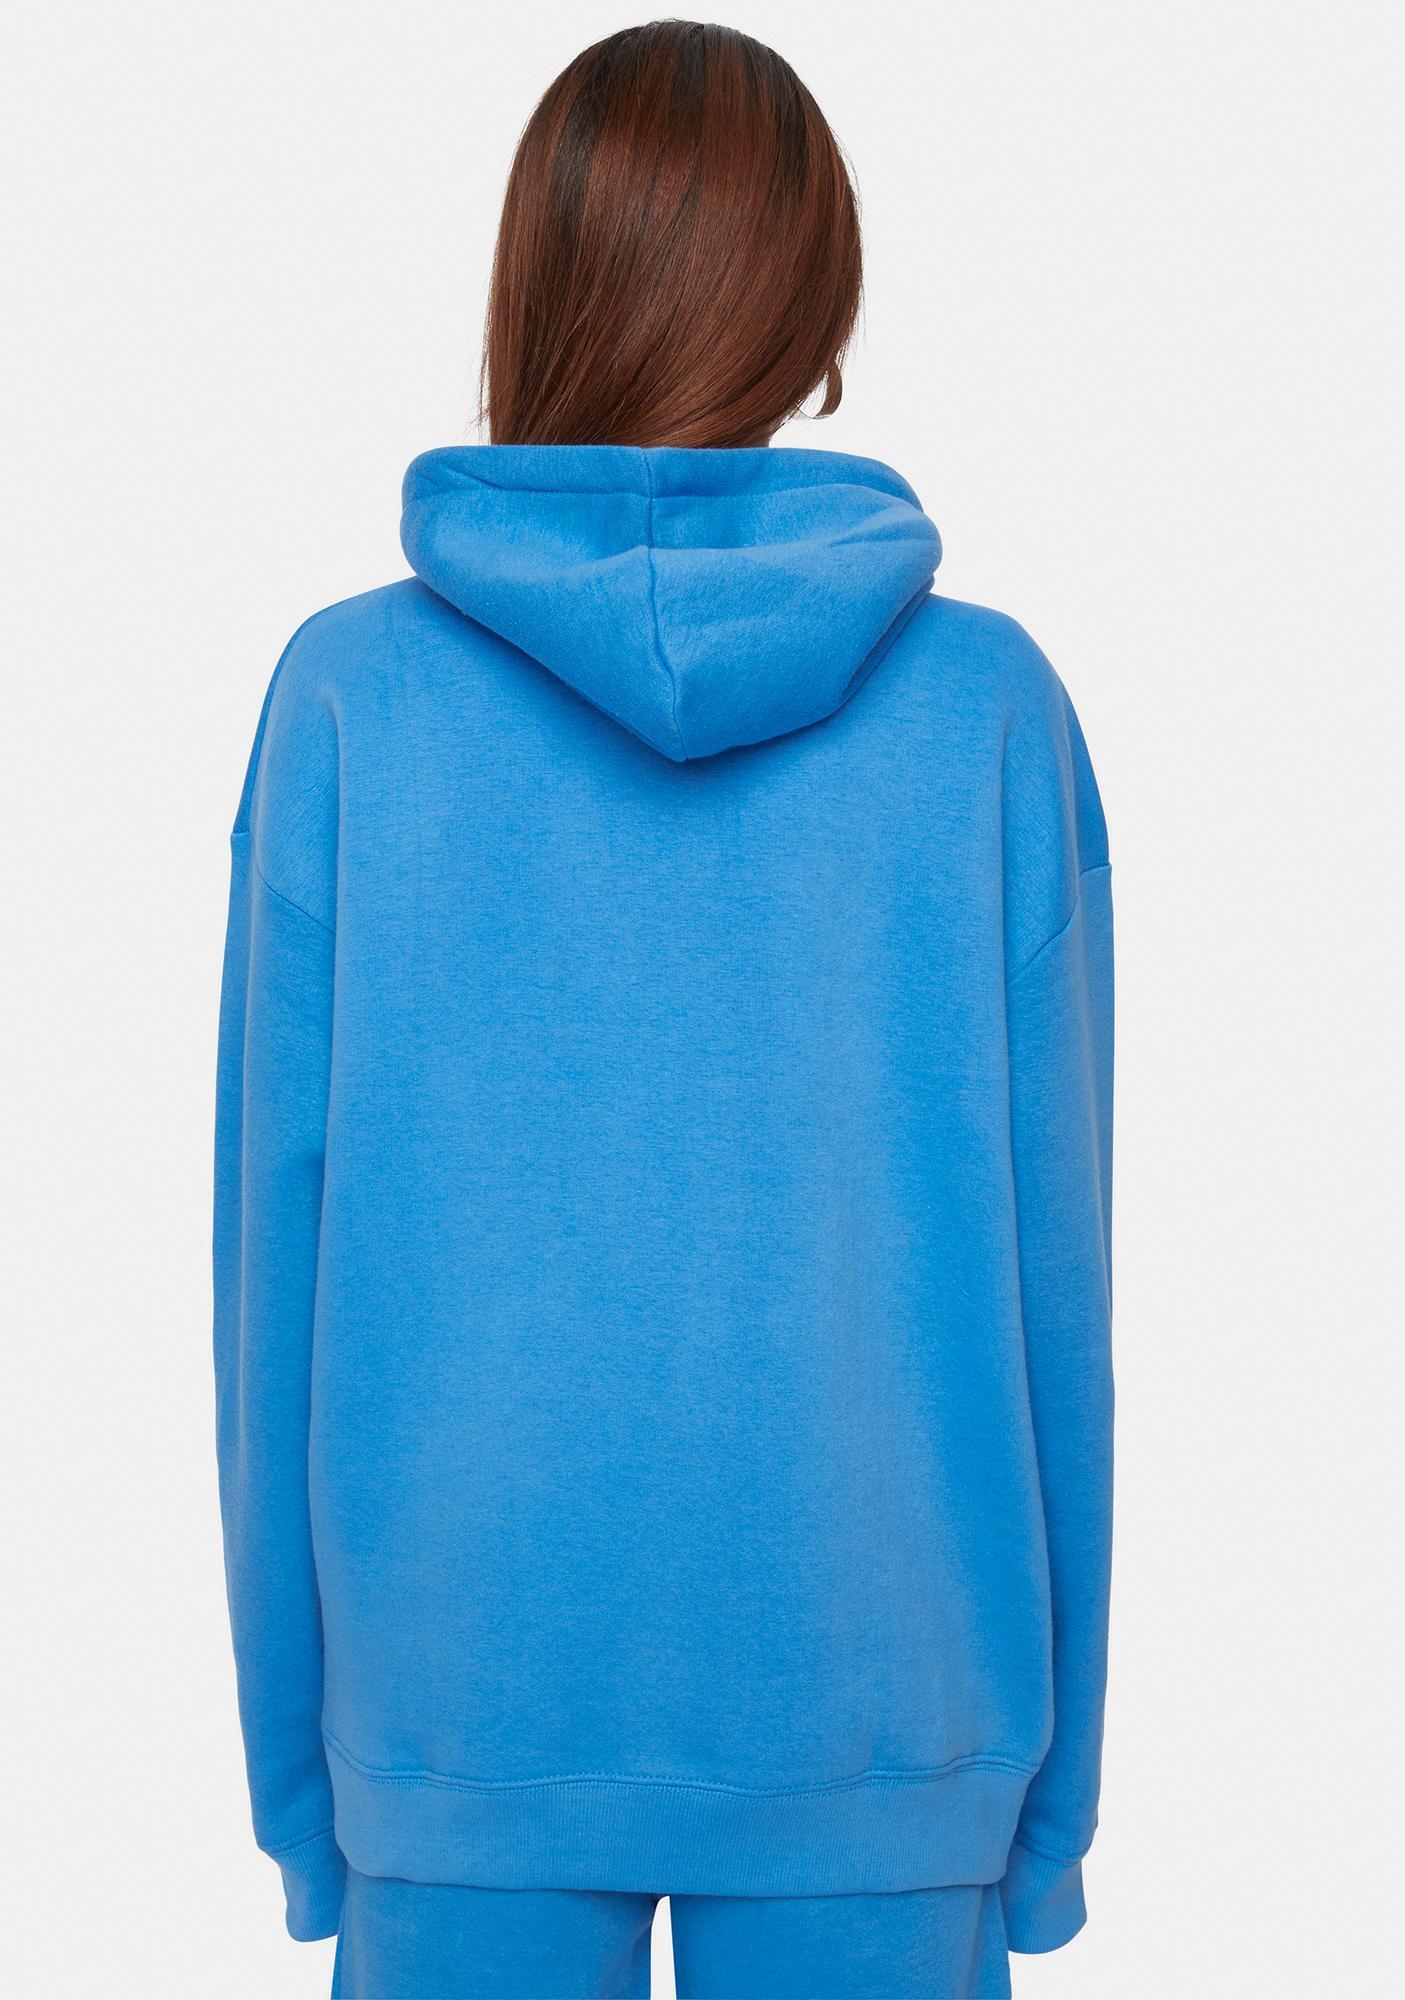 Criminal Damage Blue Hoodie With Rhinestone Embellishment